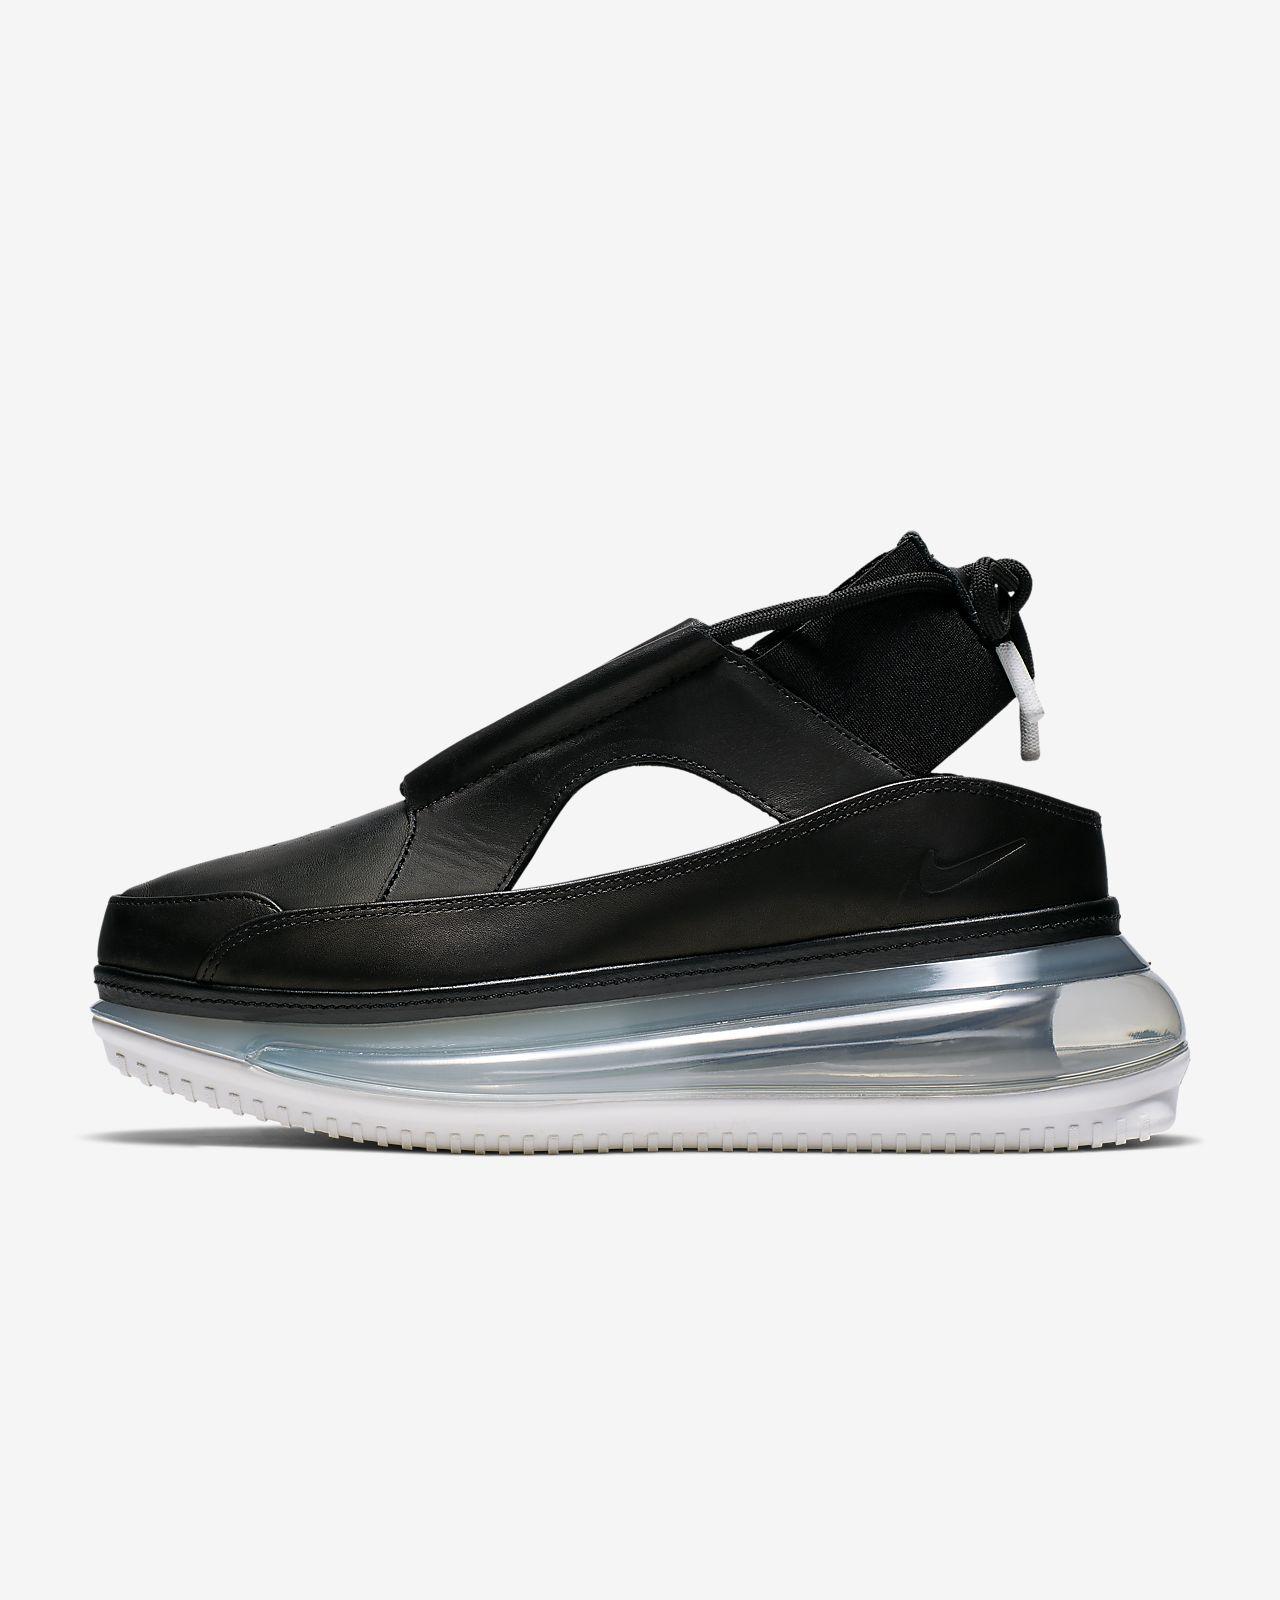 Nike Air Max FF 720 Sabatilles - Dona